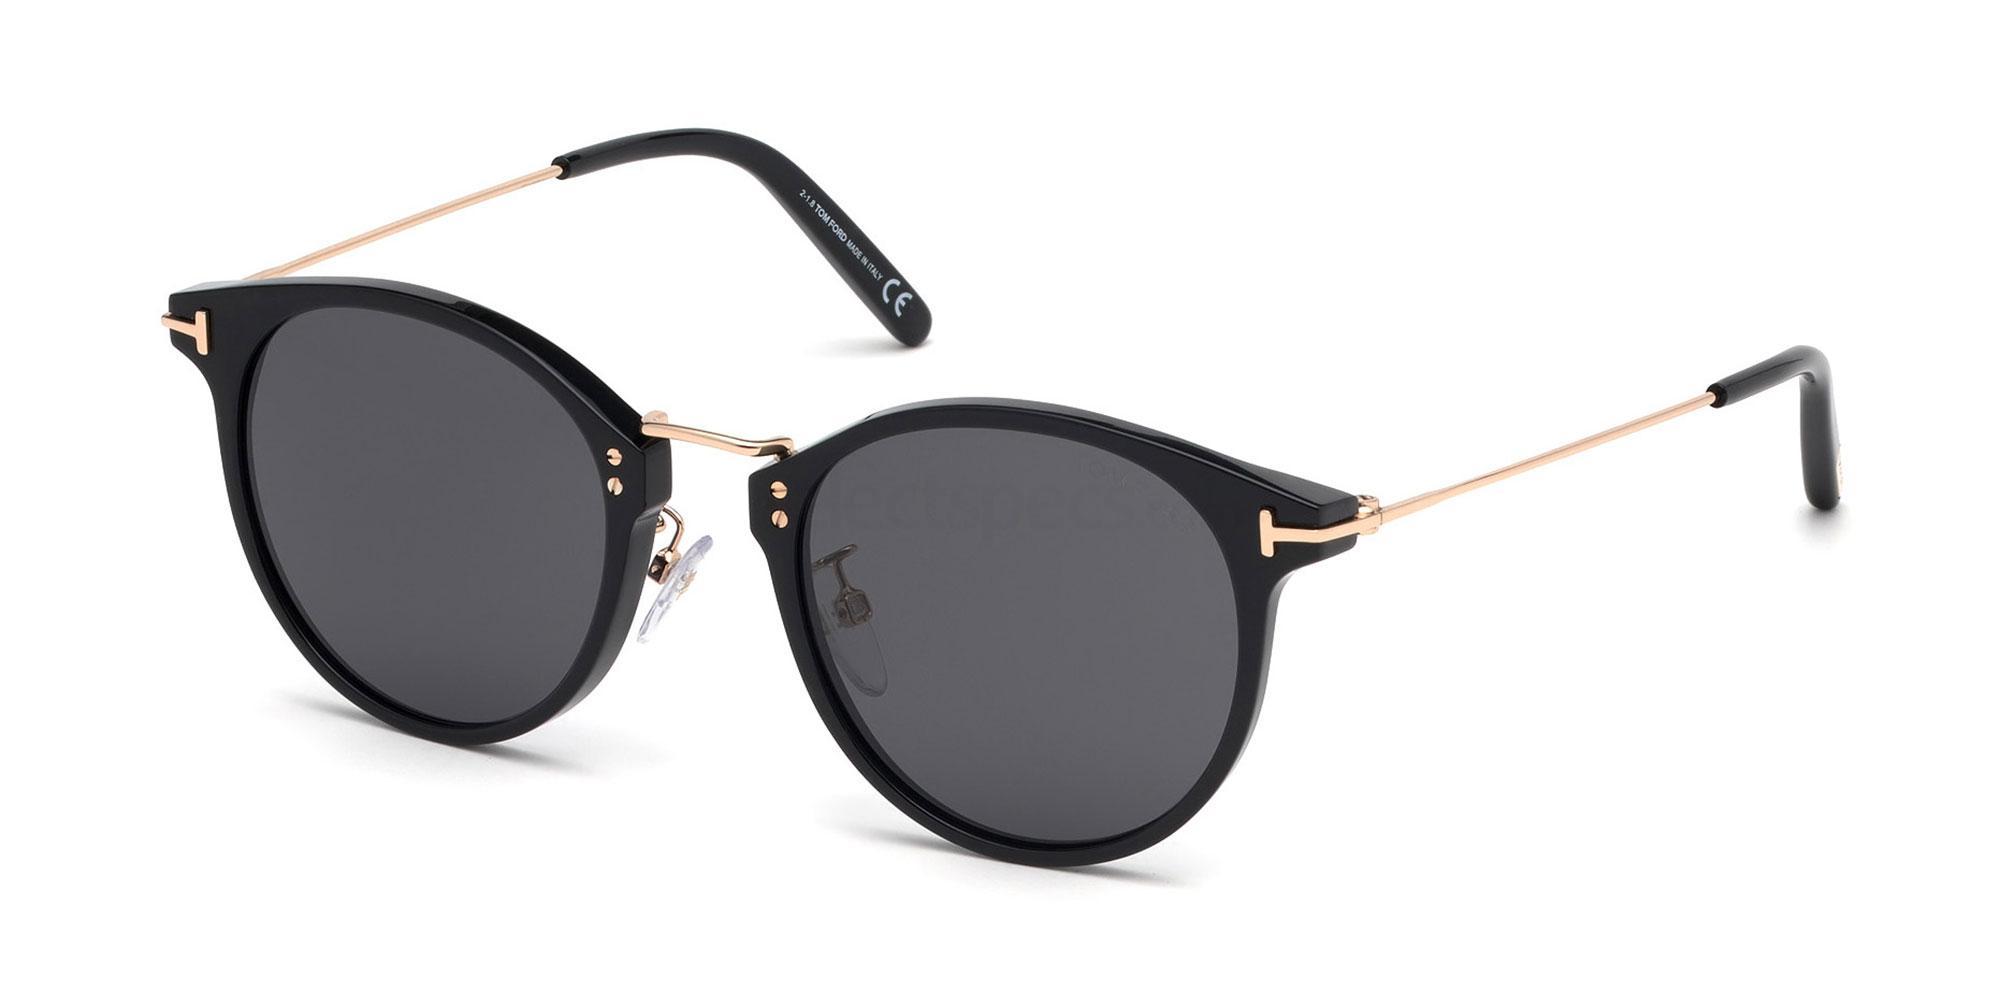 01A FT0673 Sunglasses, Tom Ford